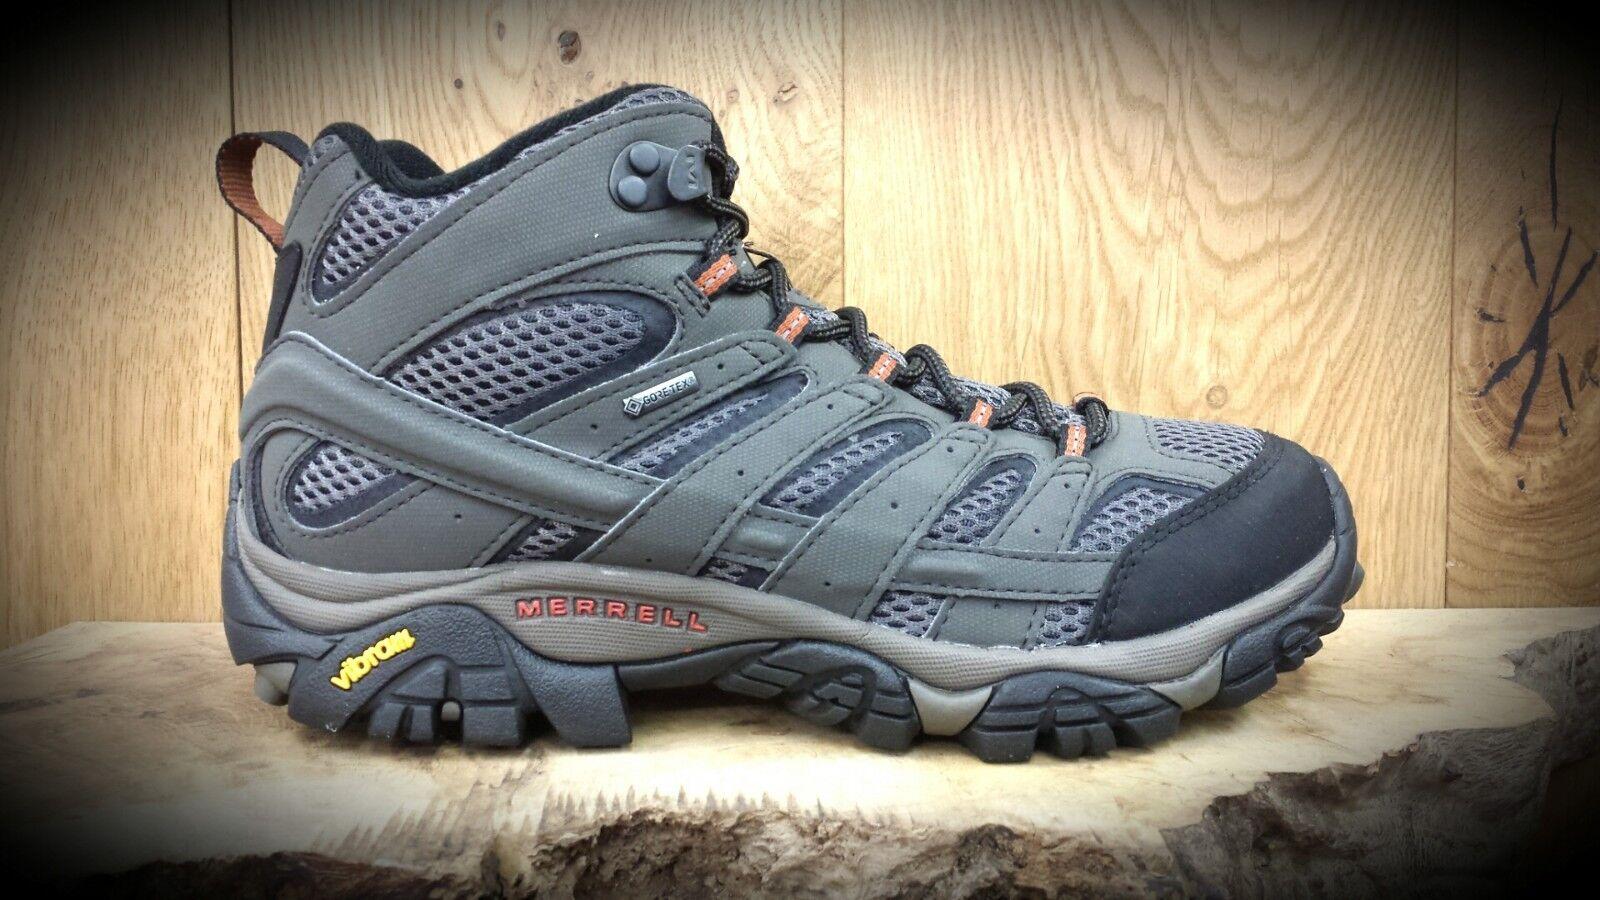 MERRELL    Moab 2 Mid GTX    Mens Gore-Tex Walking Hiking Boots    NEW